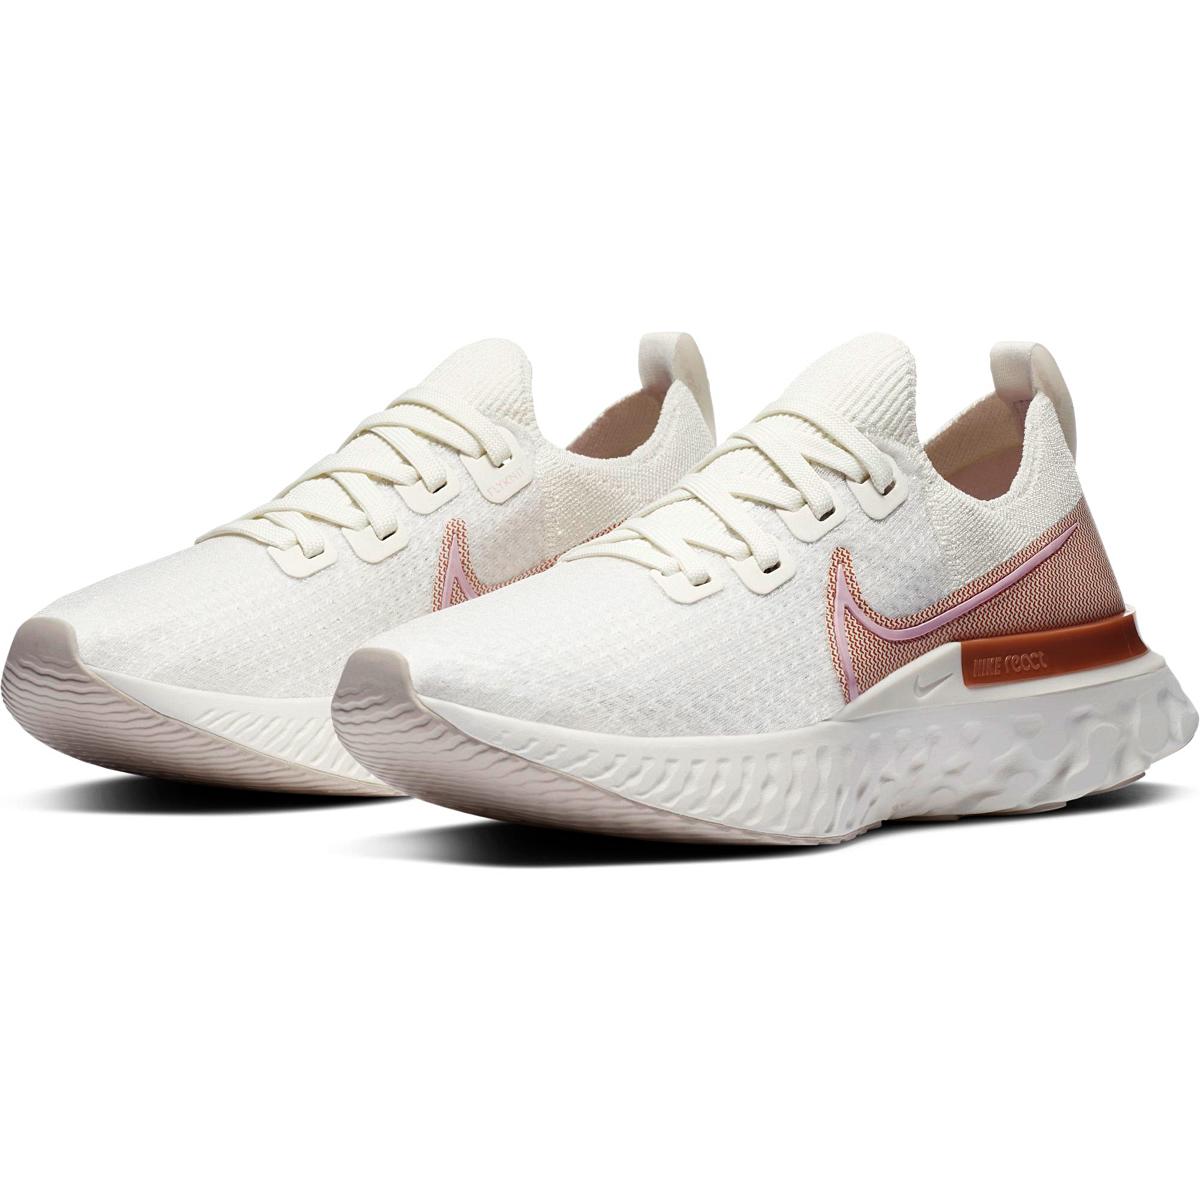 Women's Nike React Infinity Run Flyknit Running Shoe - Color: Sail/Metallic Copper/White/Light Arctic Pink - Size: 5 - Width: Regular, Sail/Metallic Copper/White/Light Arctic Pink, large, image 5